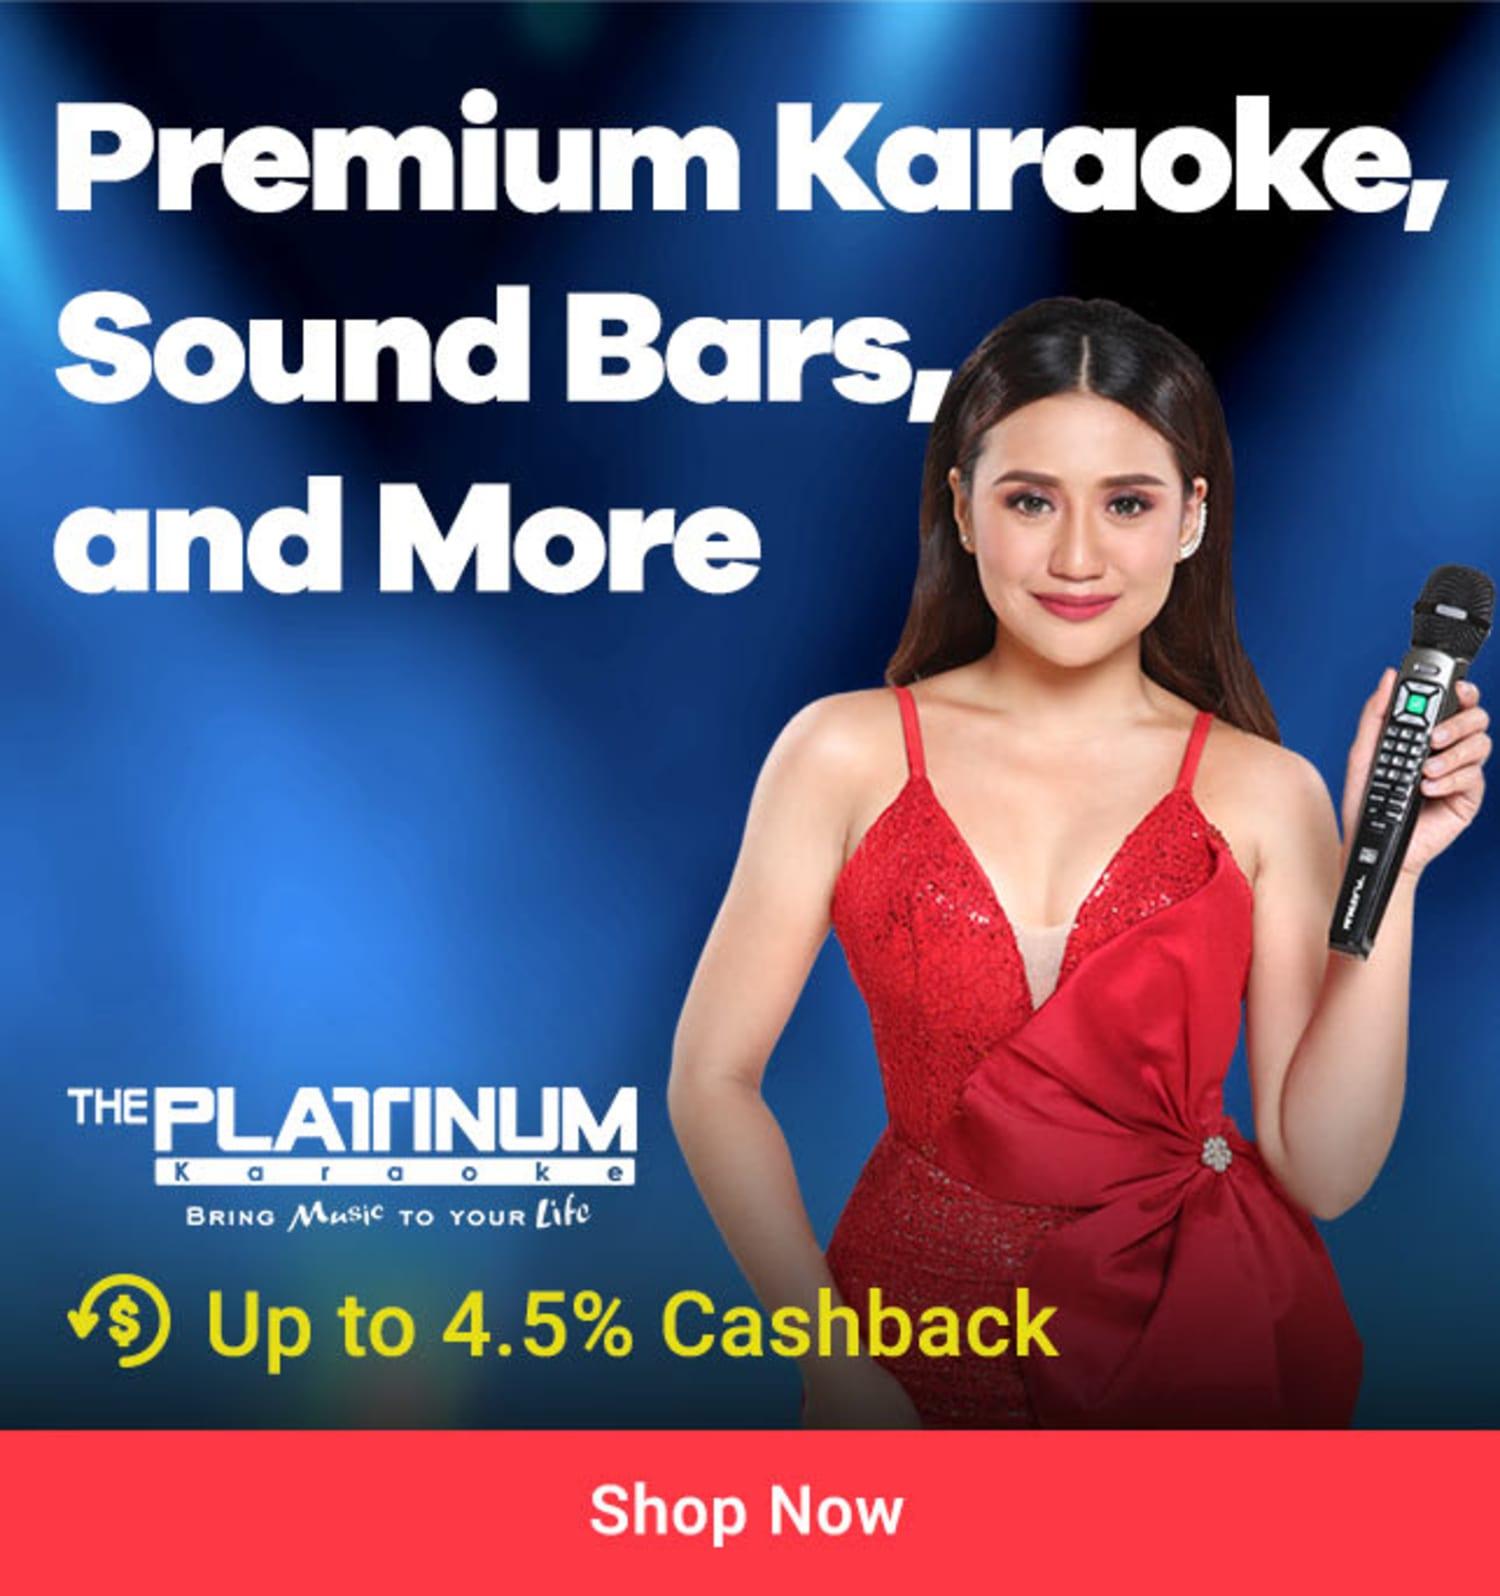 Platinum Karaoke: Premium Karaoke, Sound Bars & more